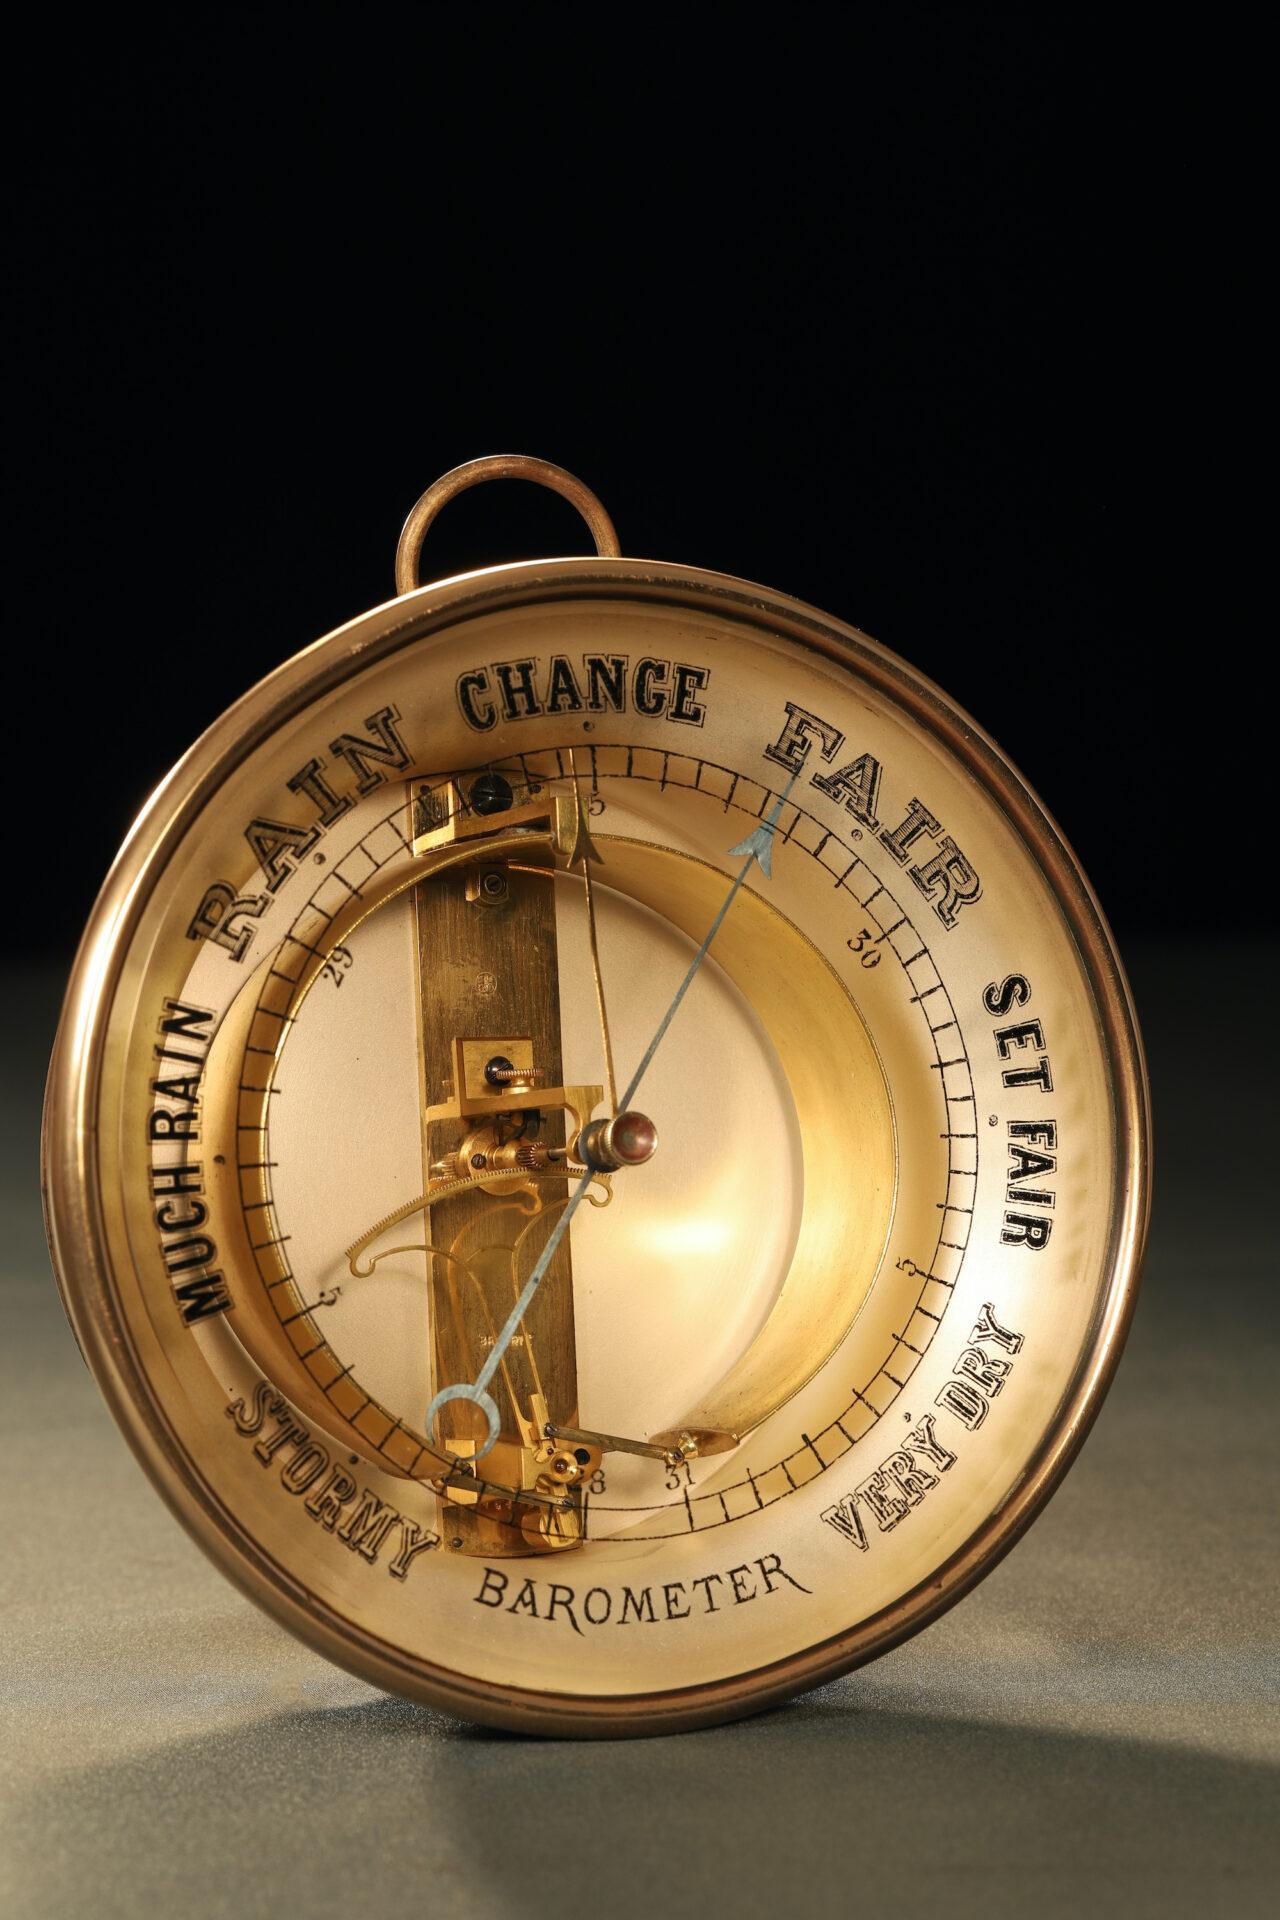 Image of Bourdon Barometer No 15178 c1880 taken from lefthand side